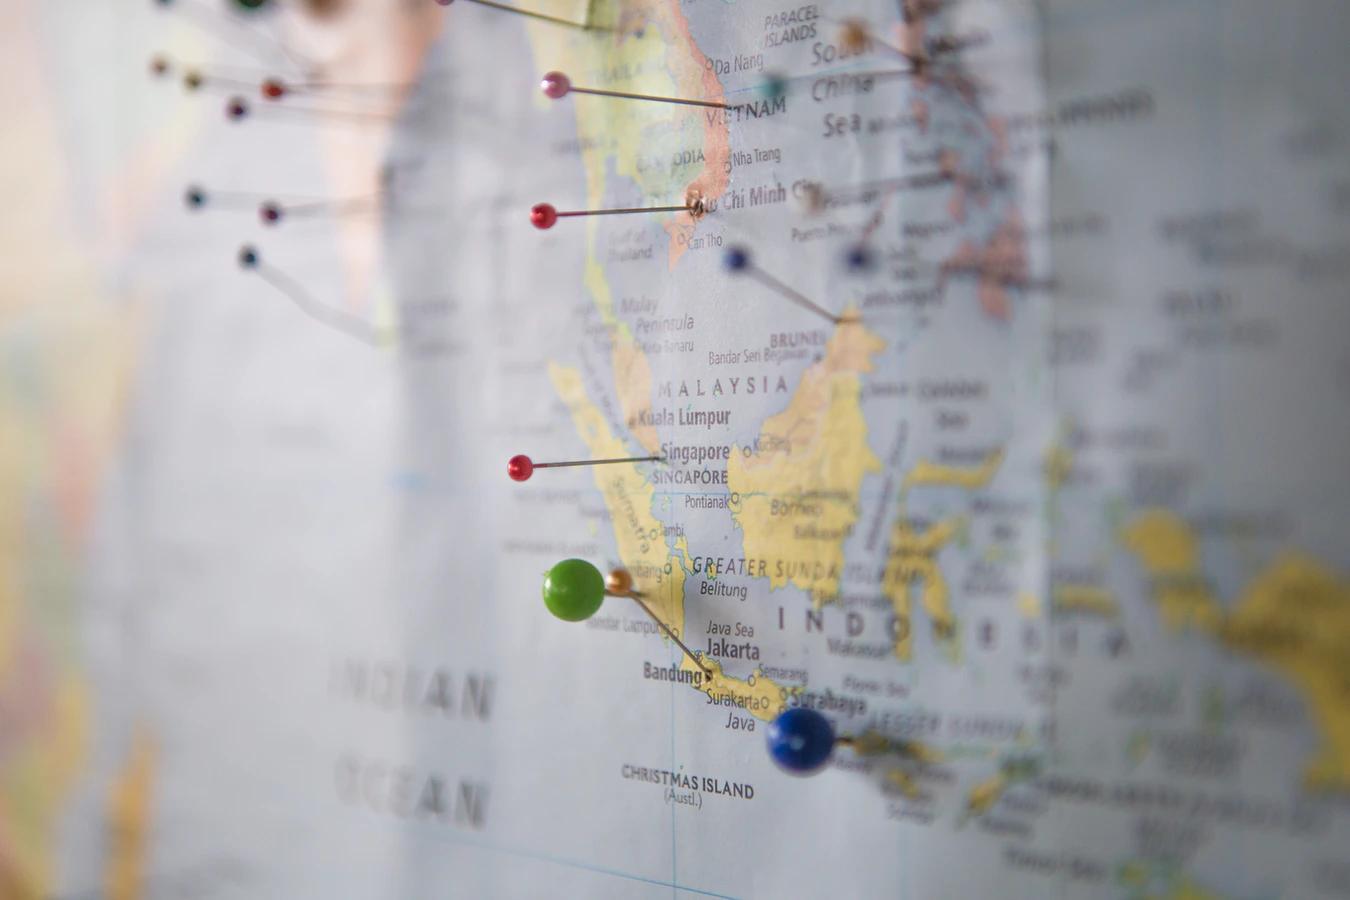 Location Analytics Explained, Map